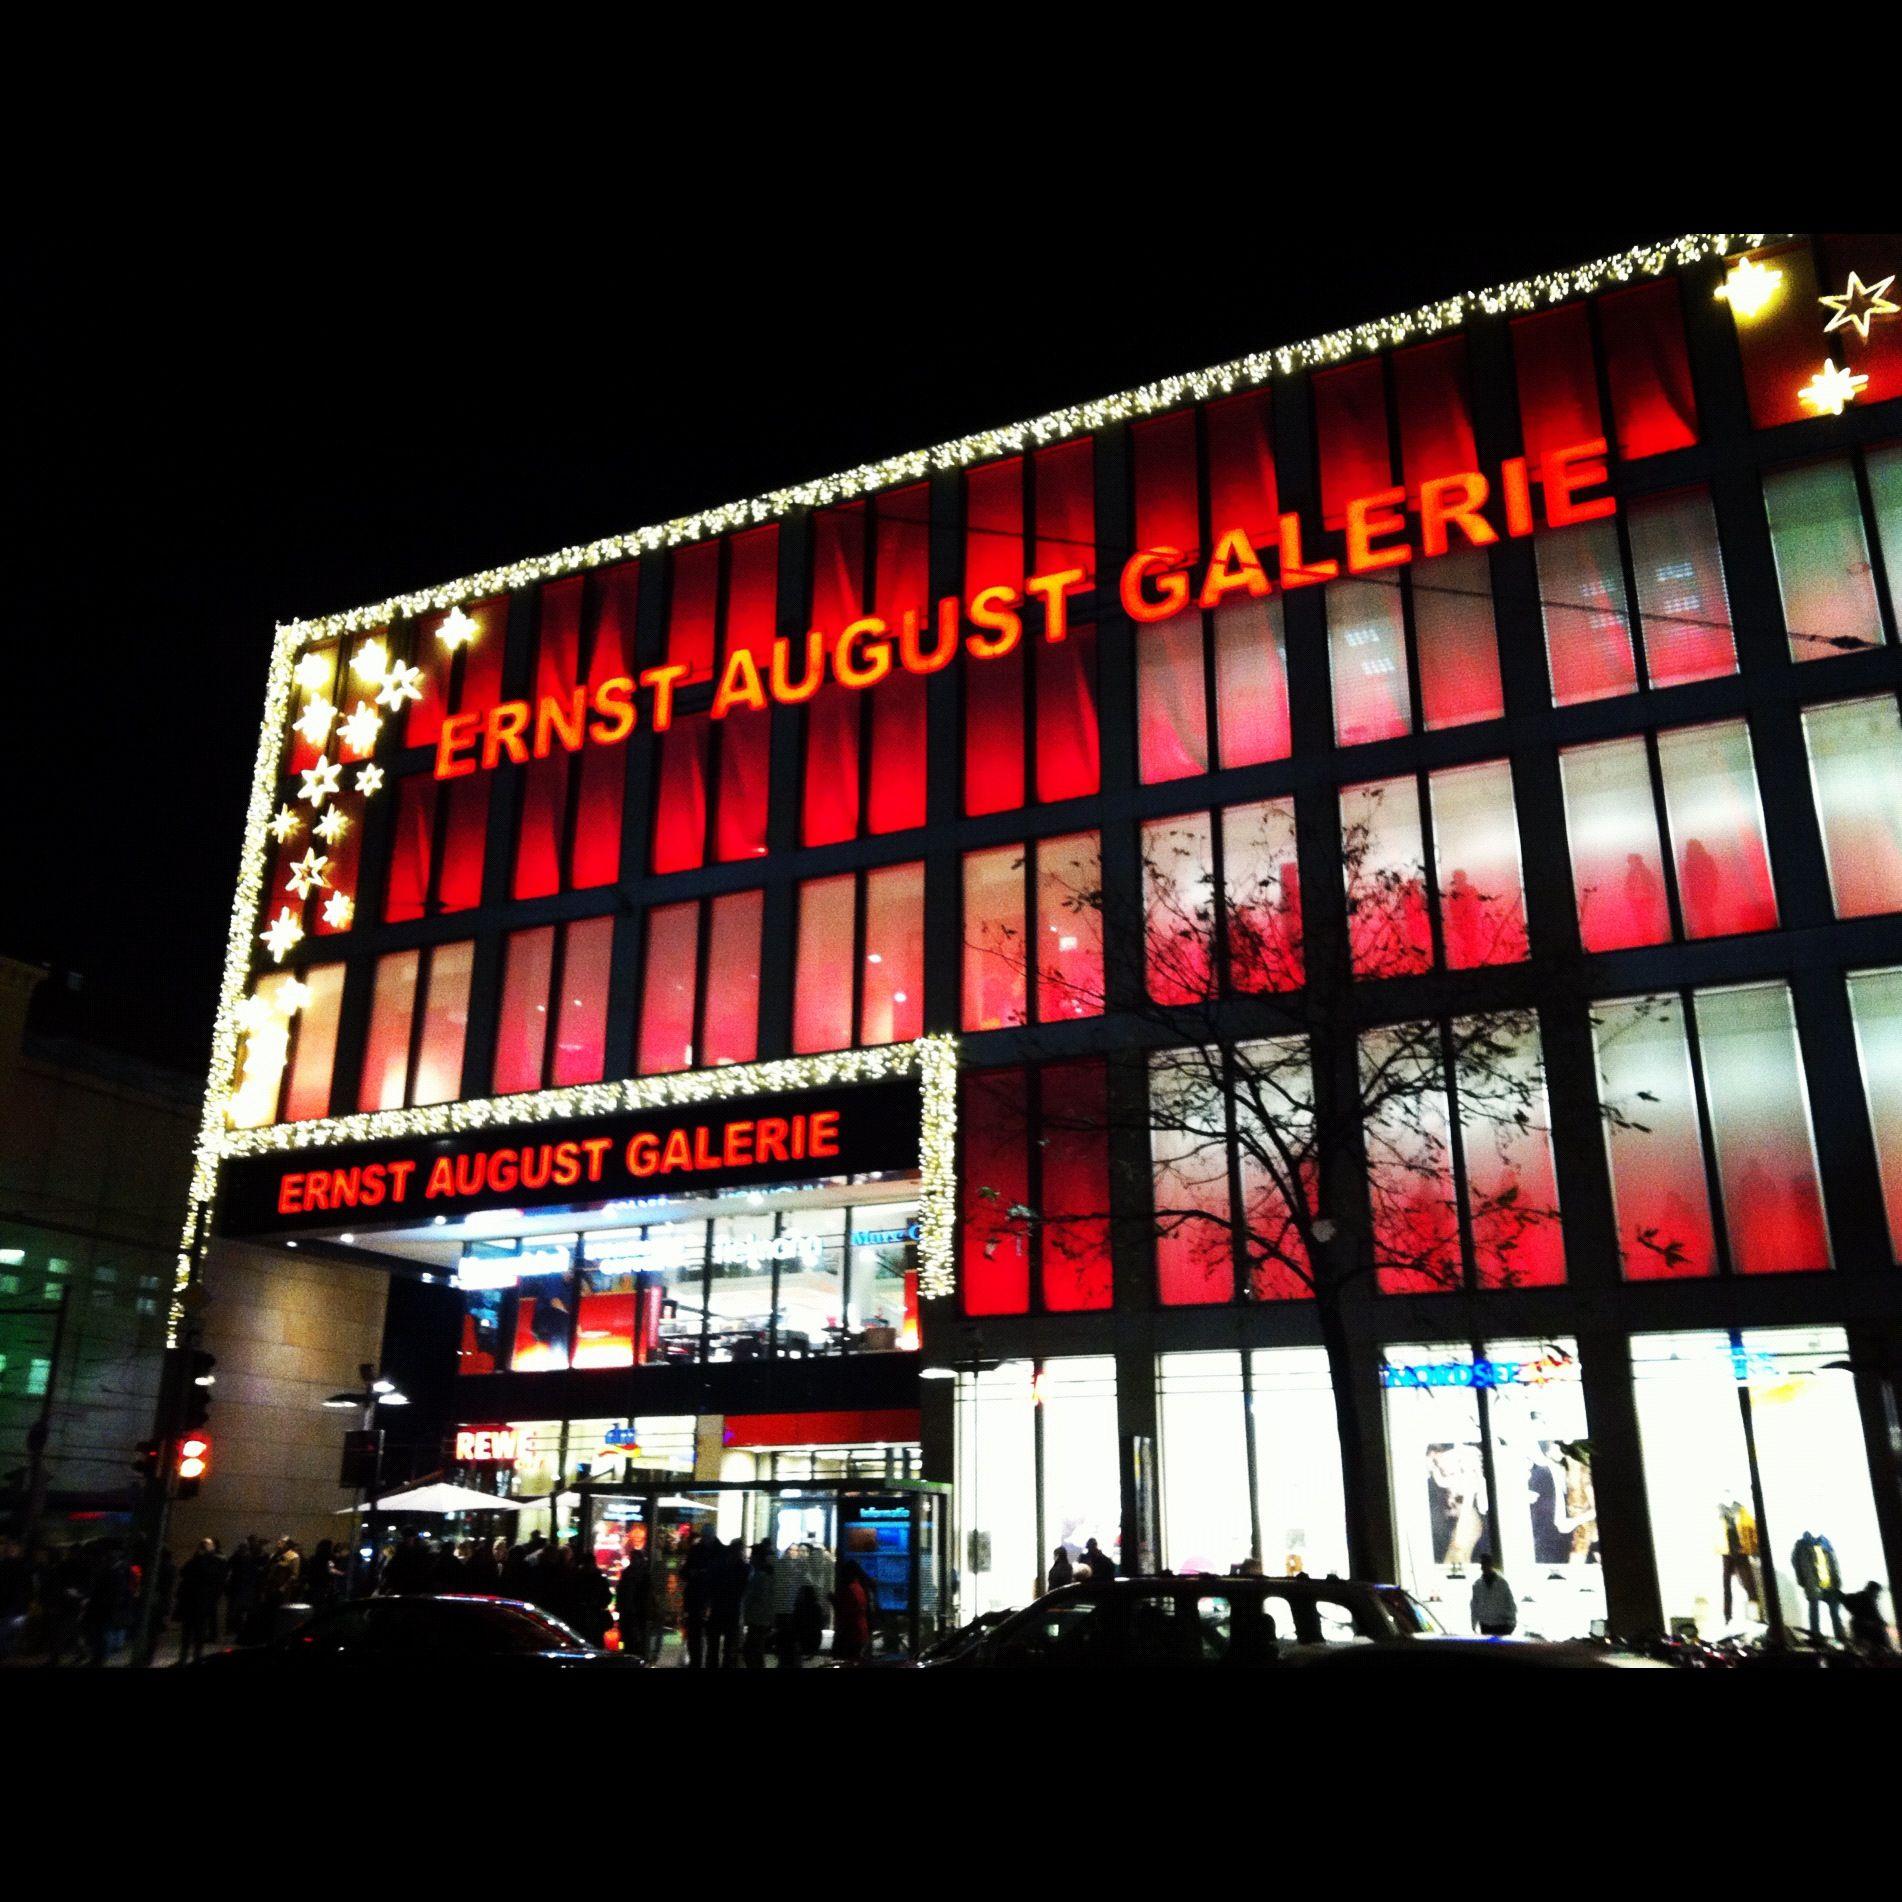 HANNOVER Innenstadt Ernst August Galerie rote Beleuchtung